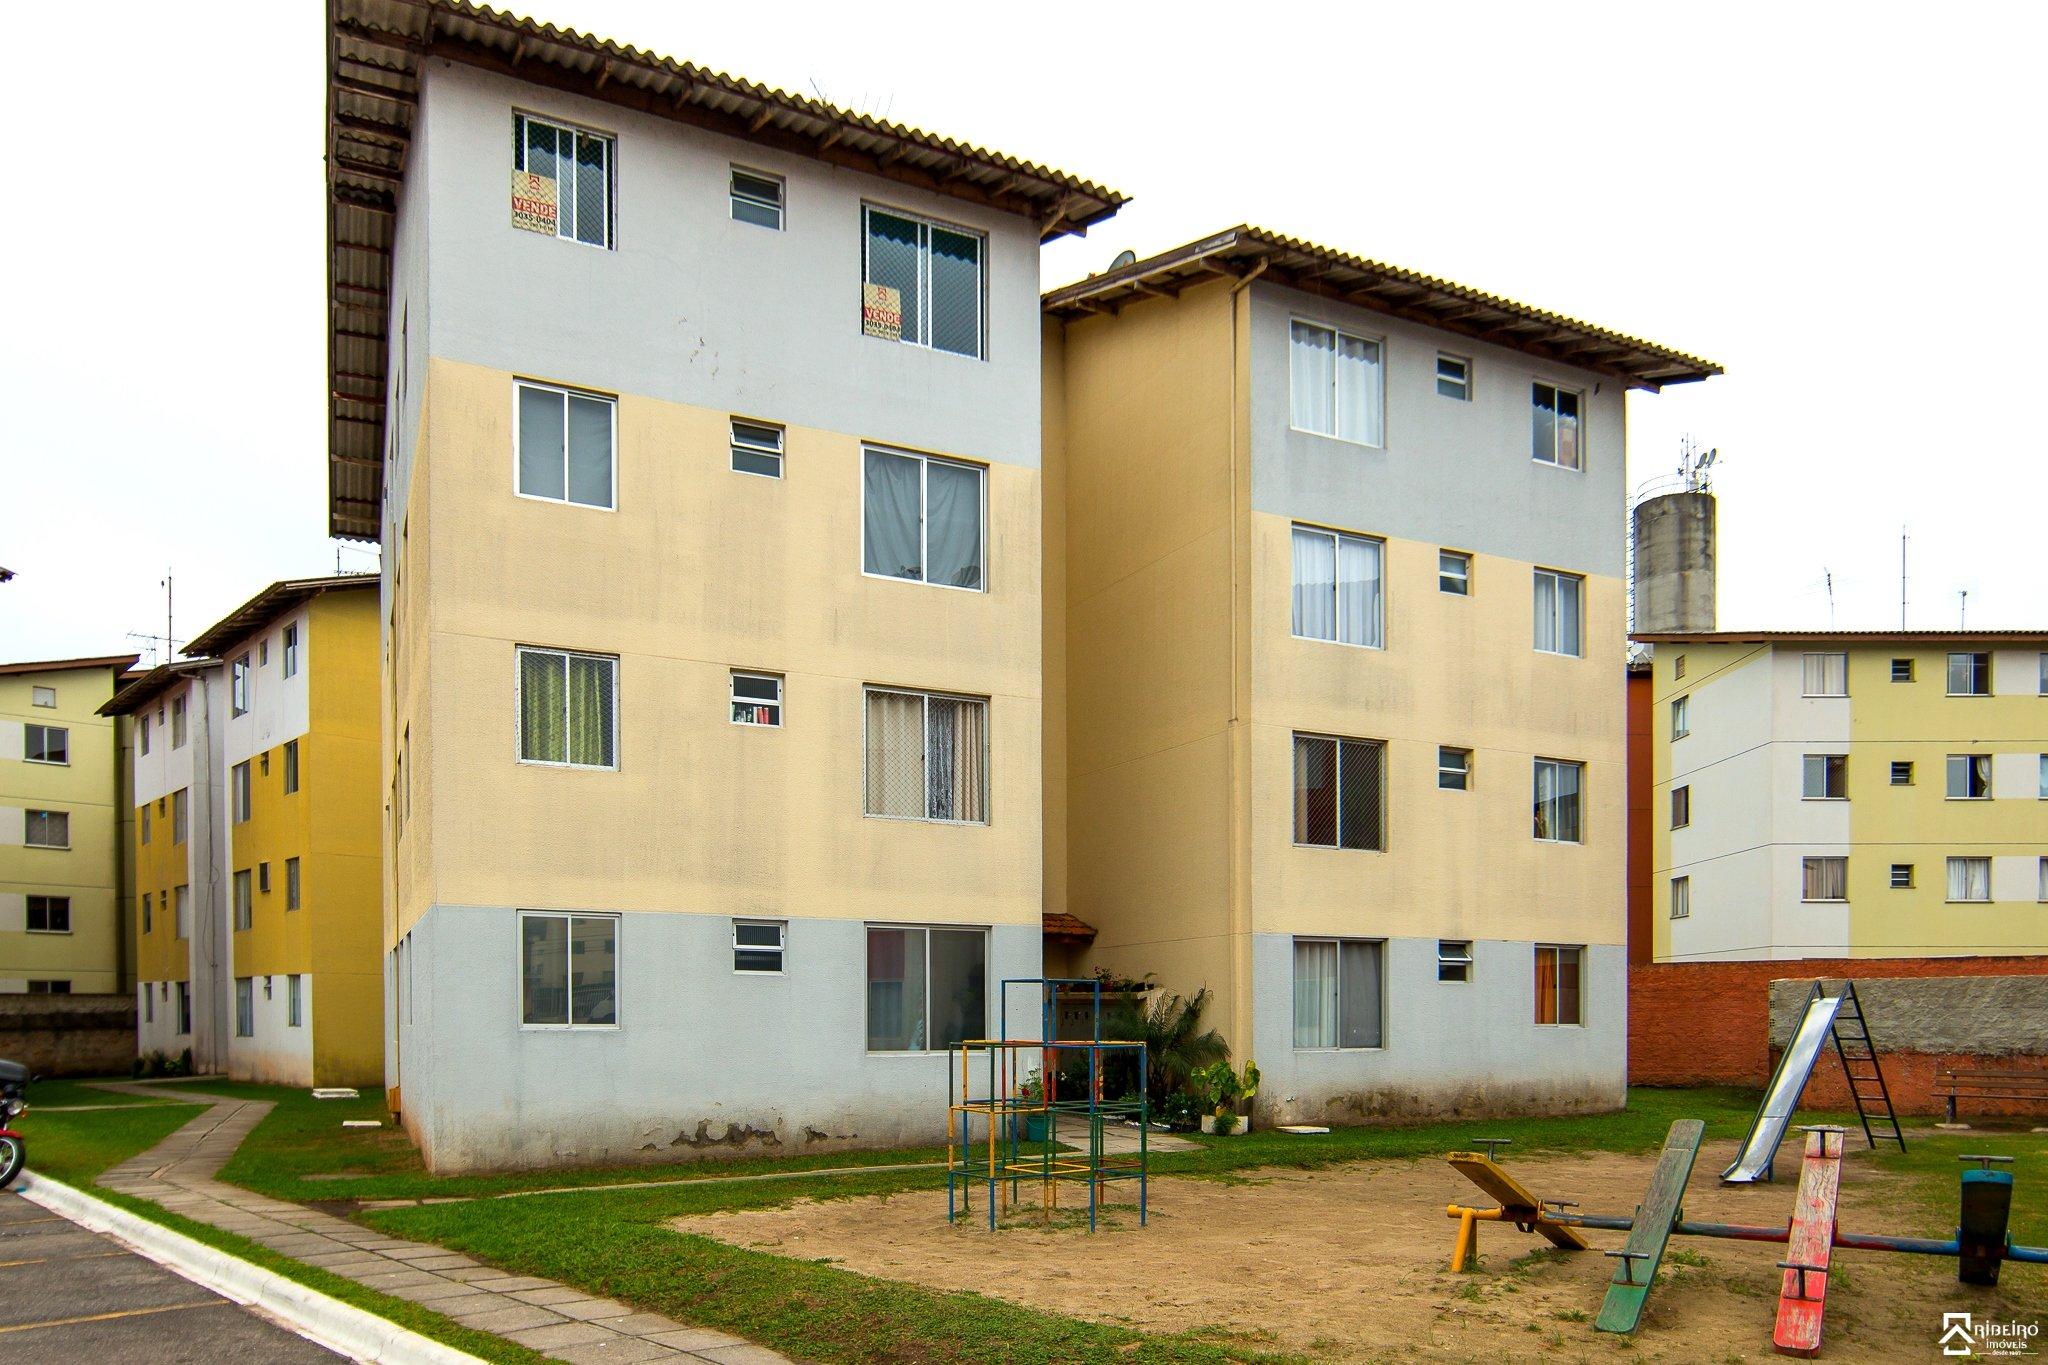 REF. 6928 -  São José Dos Pinhais - Rua  Anneliese Gellert Krigsner, 3033 - Apto 31 - Bl D